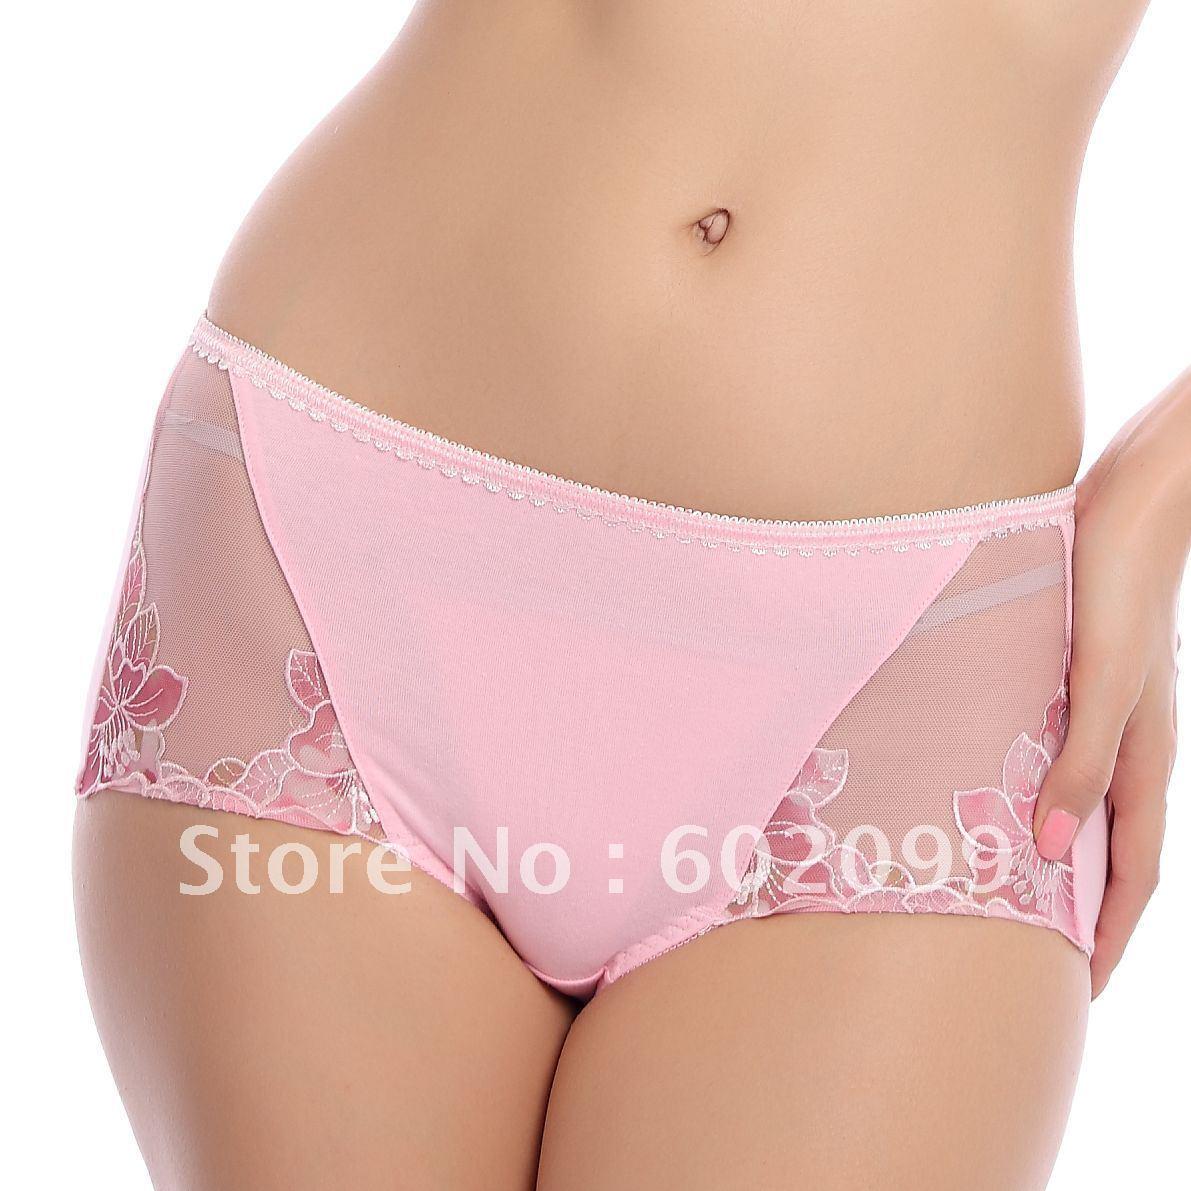 Titine high waist peony panty abdomen drawing butt-lifting 6019